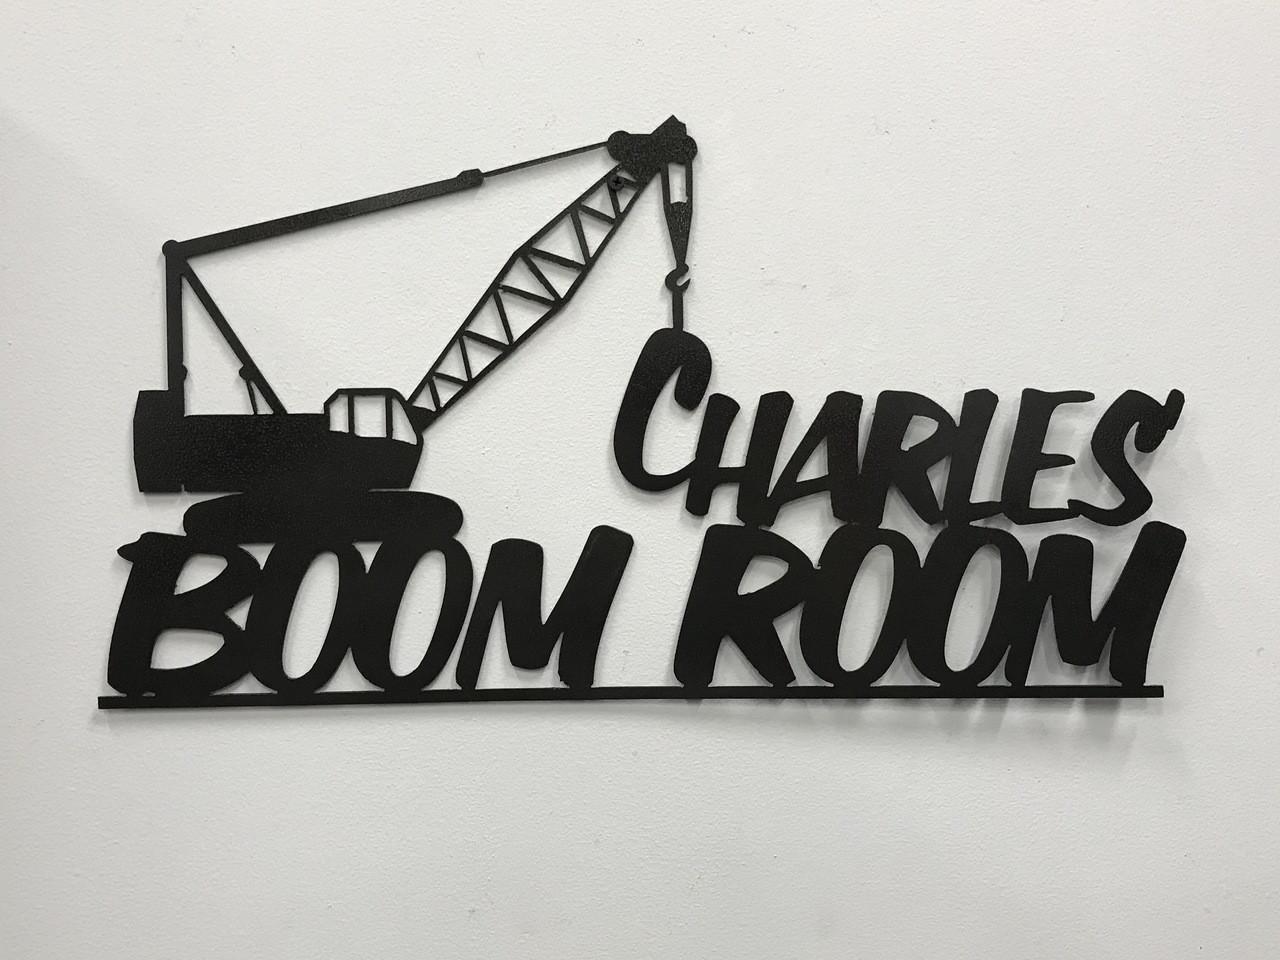 Charles' Boom Room